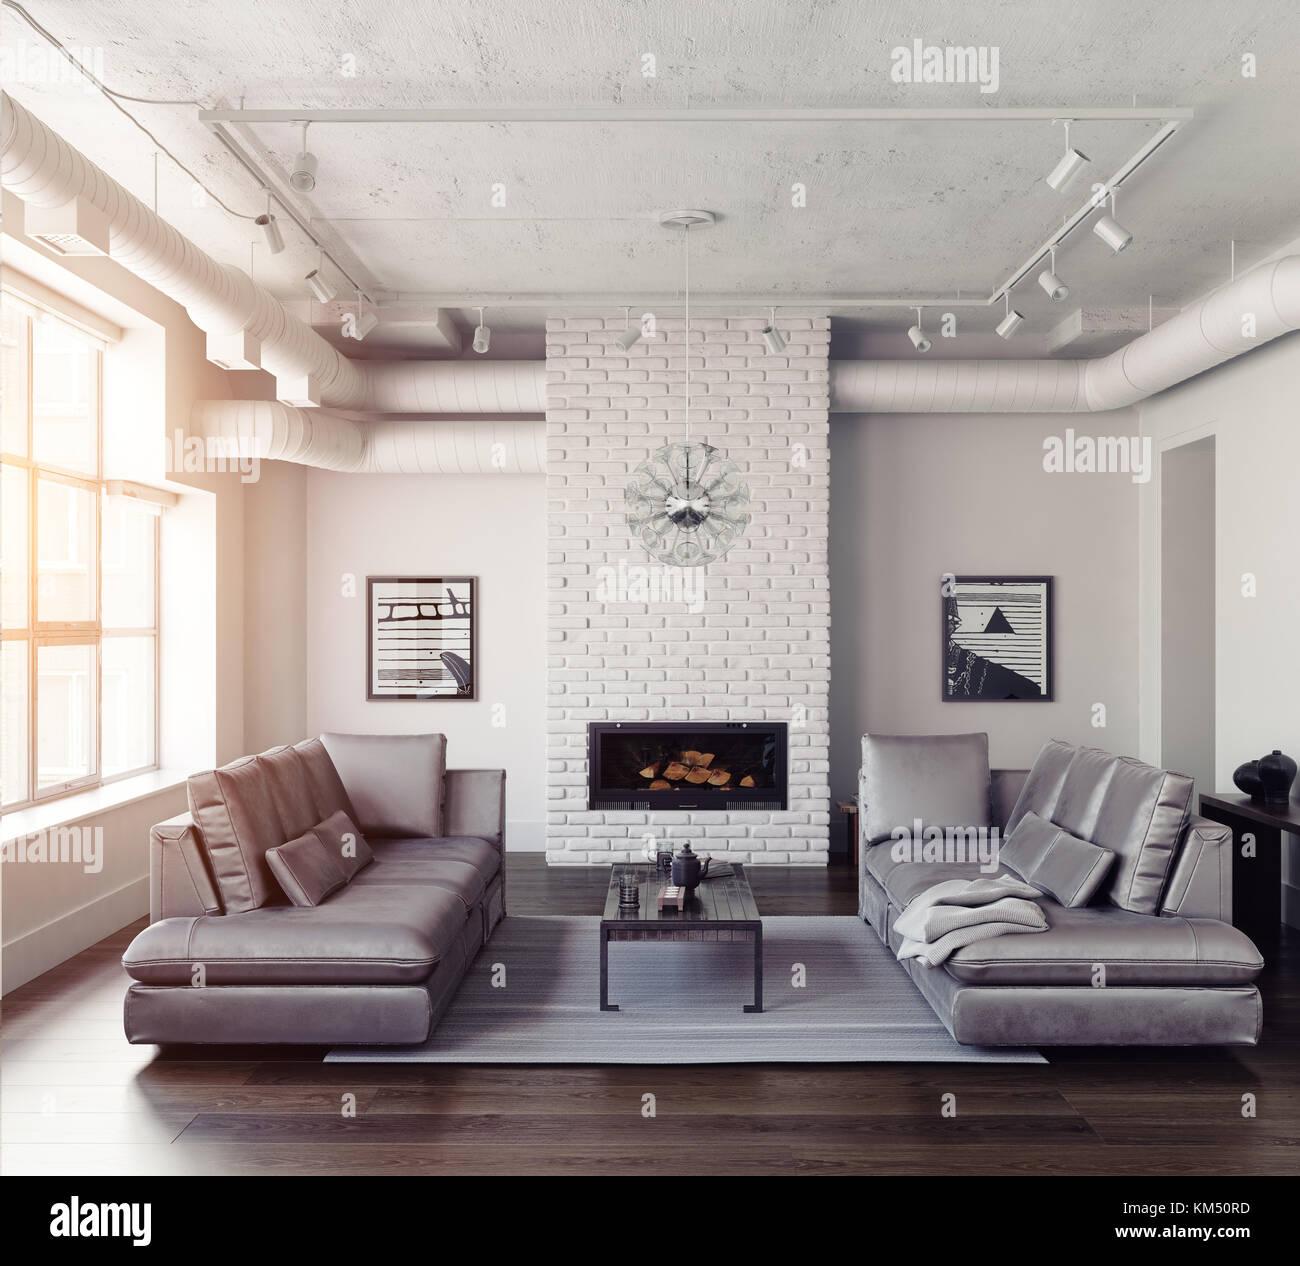 Interior Living Room Fireplace 3d Stock Photos & Interior Living ...